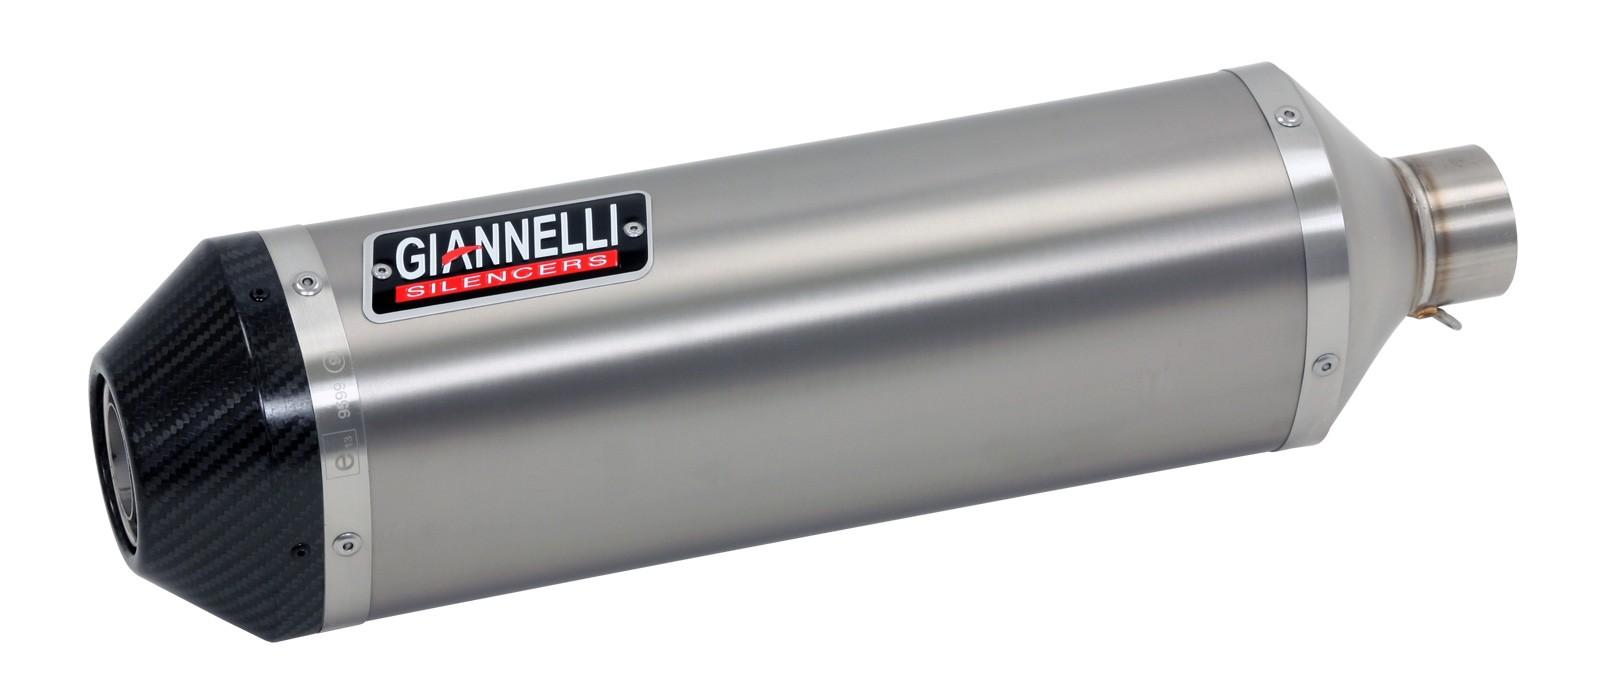 ESCAPES GIANNELLI YAMAHA - Sistema completo IPERSPORT Silenciador aluminio versión Black Line Yamaha BW'S 125 4T Gianne